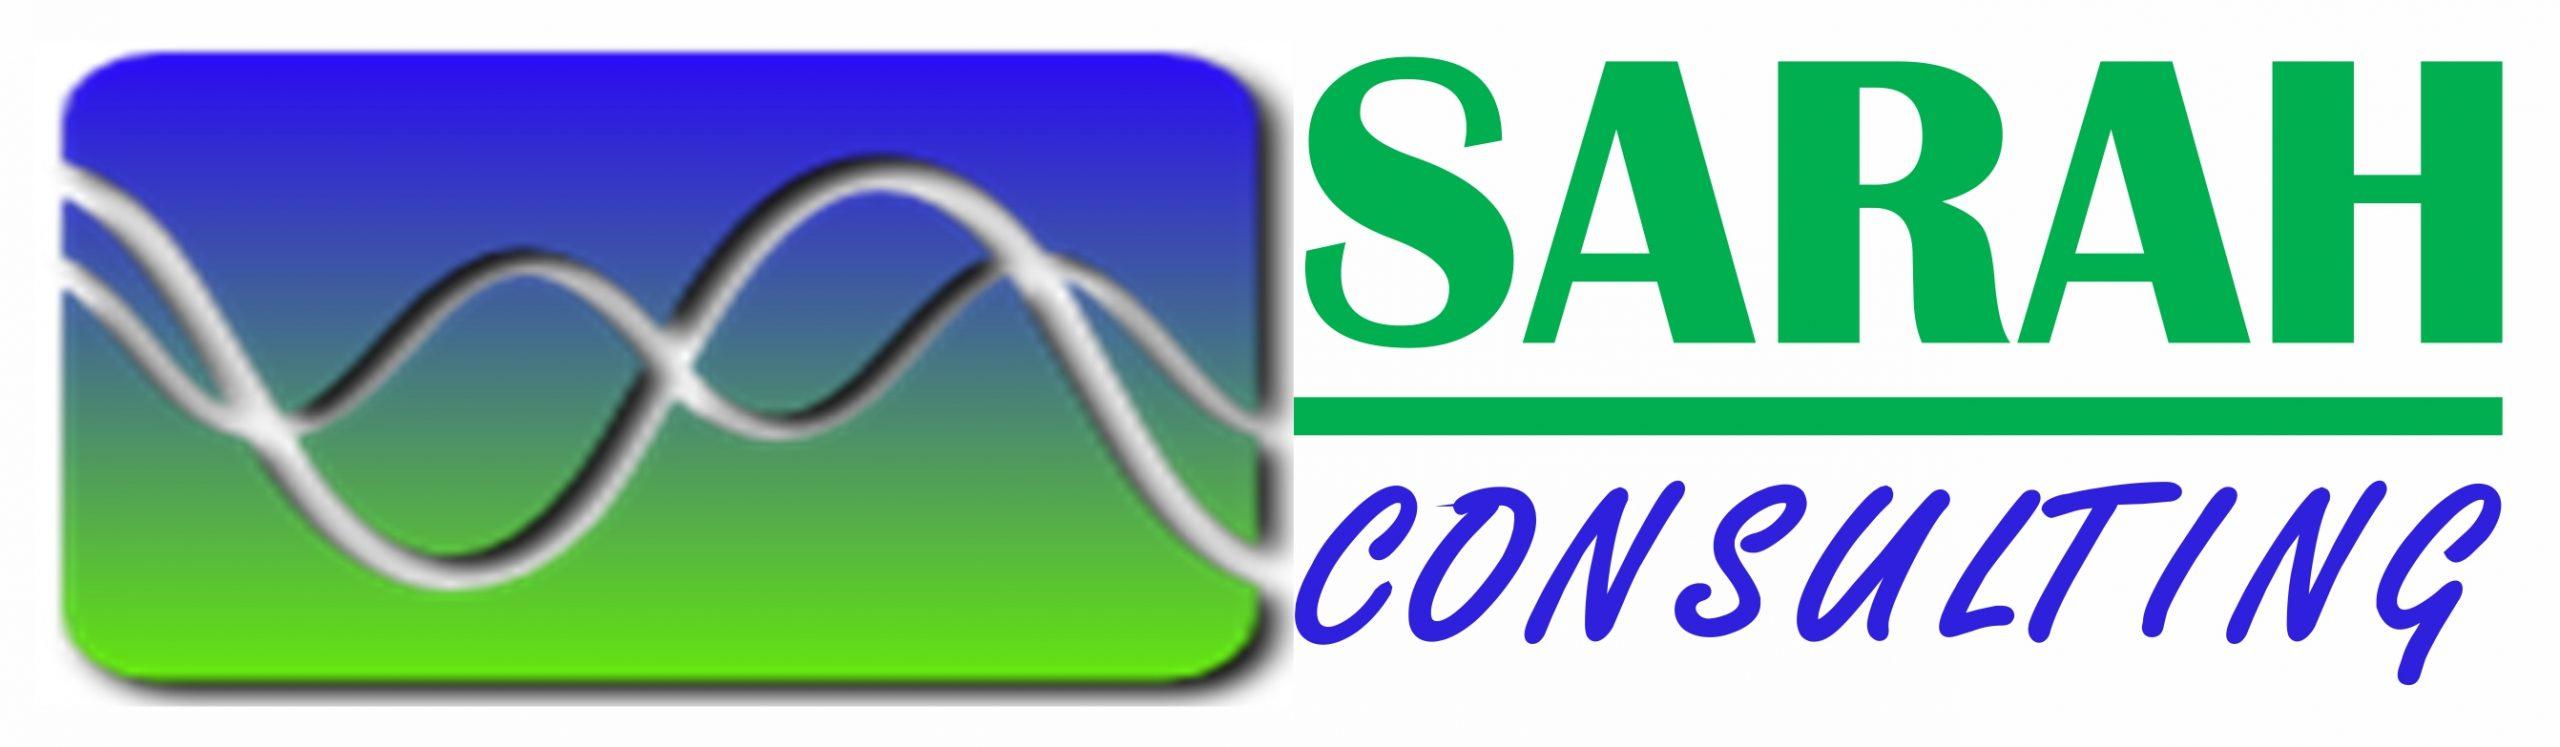 SARAH Consulting